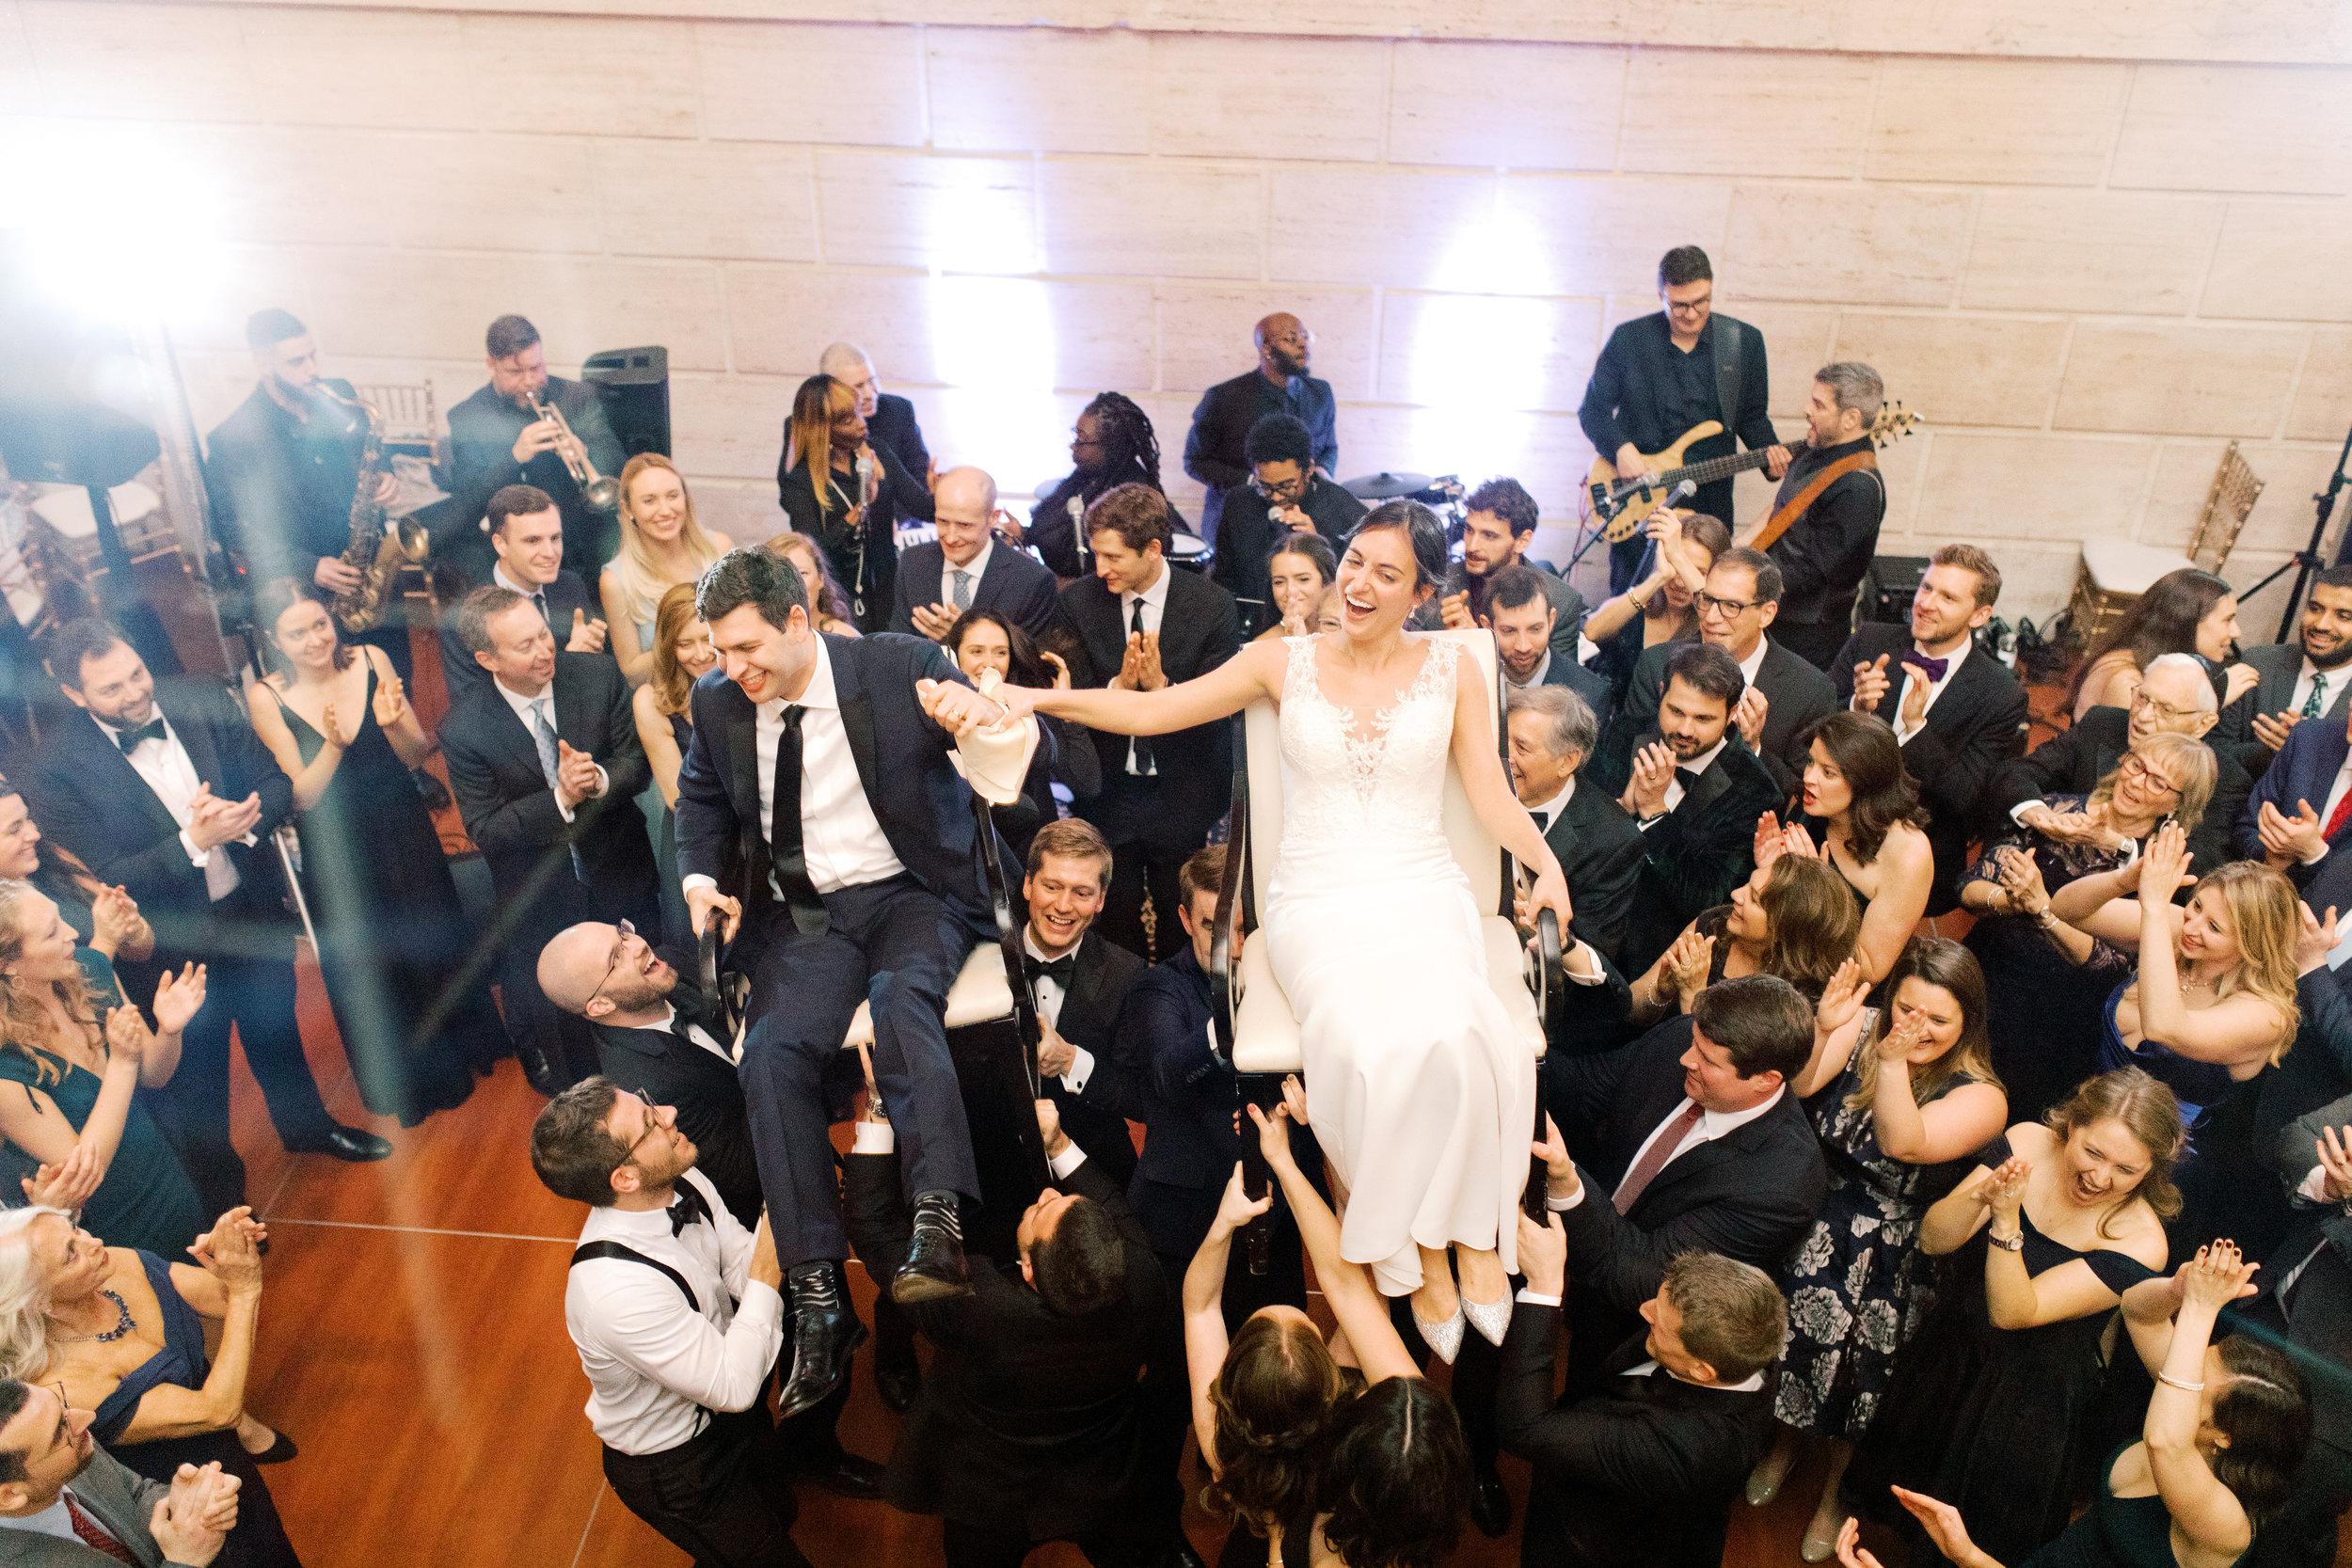 haley-richter-photography-classic-winter-union-trust-philadelphia-wedding-100.jpg